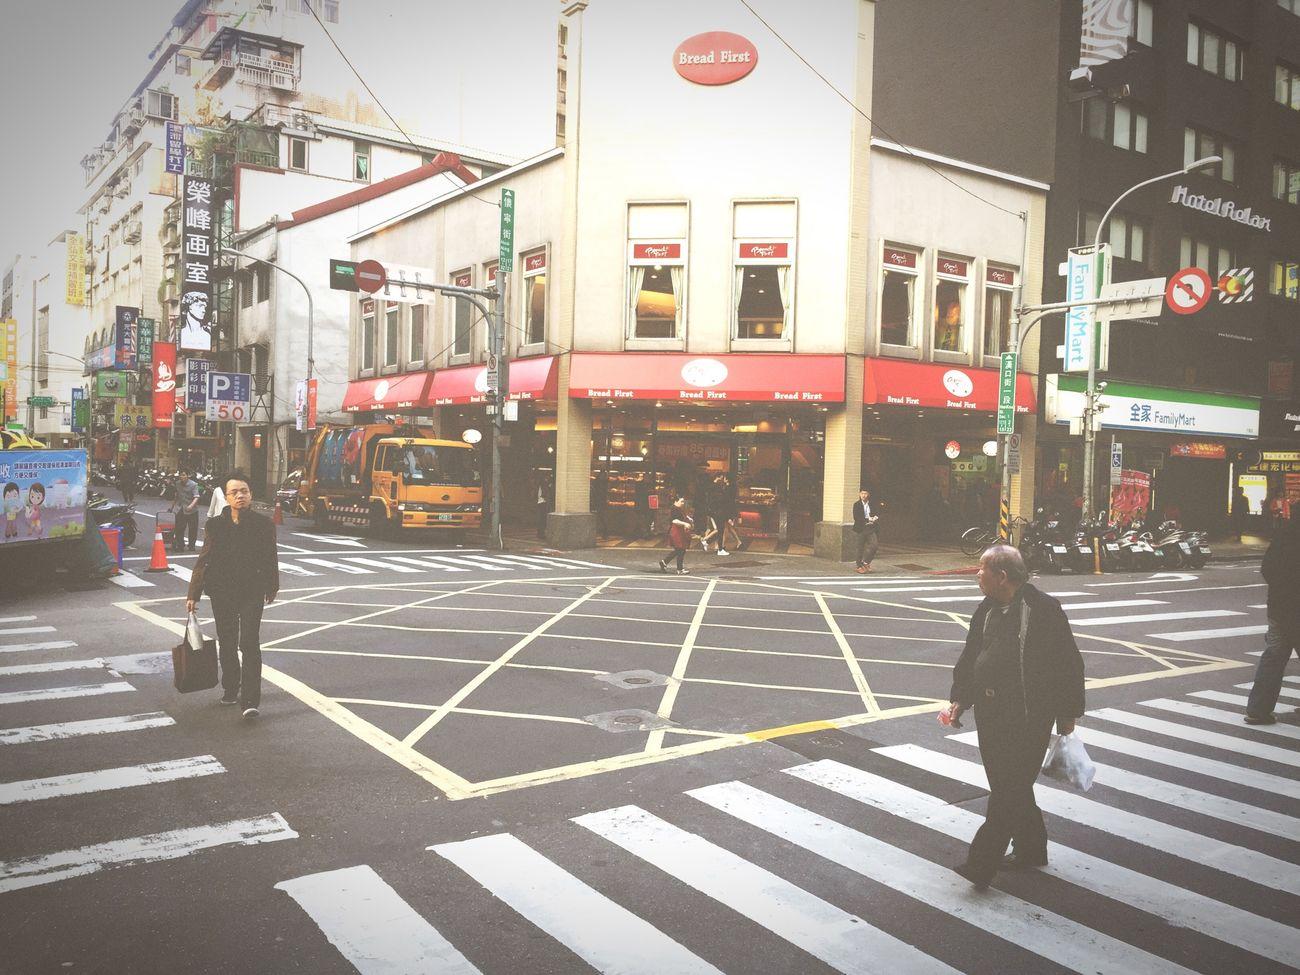 Crossroads Streetphotography Street Photography Streetphoto Snap Snapshot Street Life Taipei Cityscapes